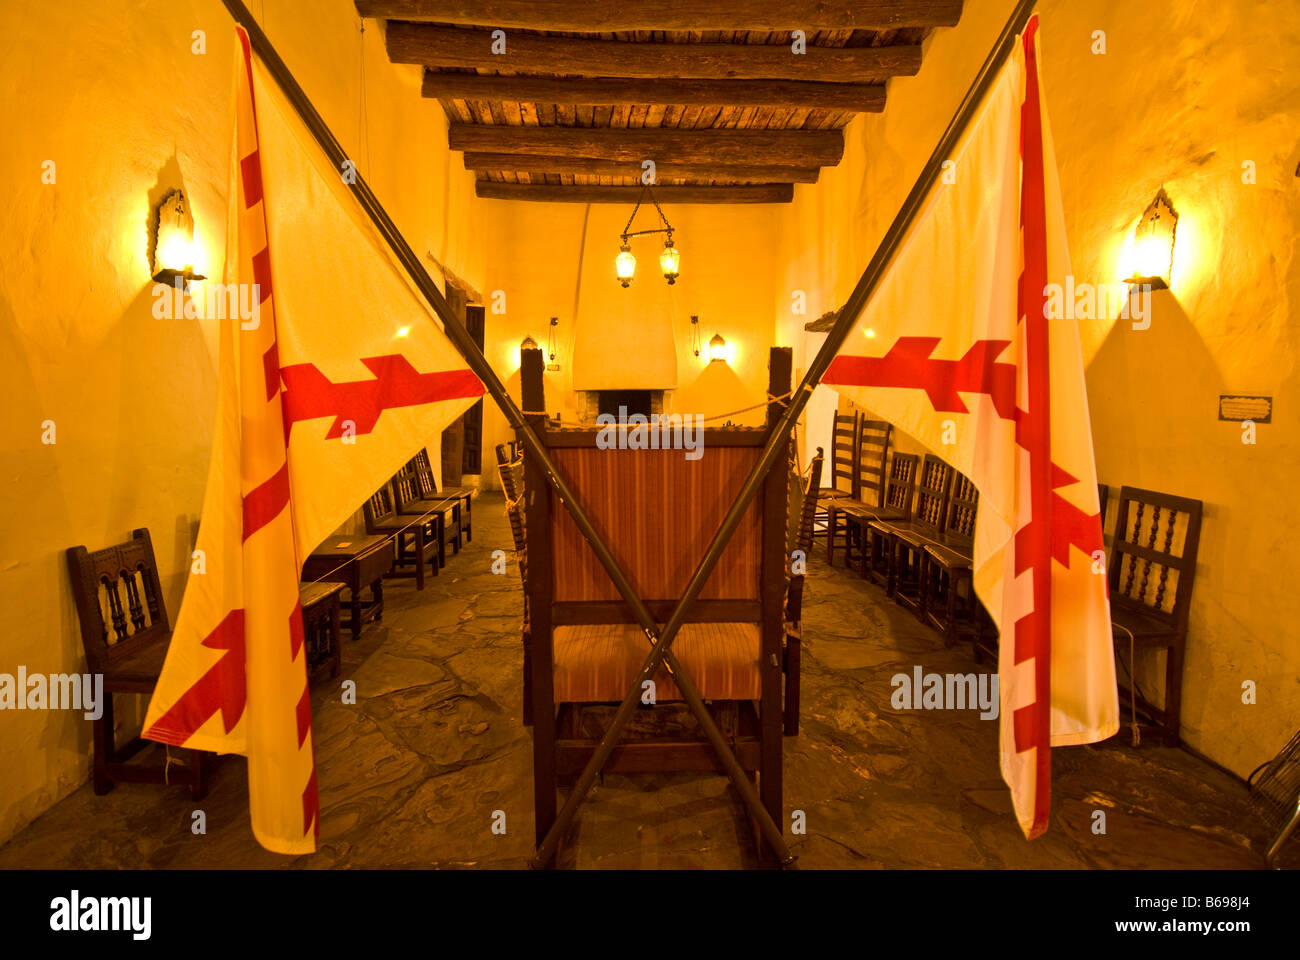 Monterrey Furniture San Antonio #17: ReNewal Home Décor \u2013 San Antonio, TX \u2013 Dining Chairs